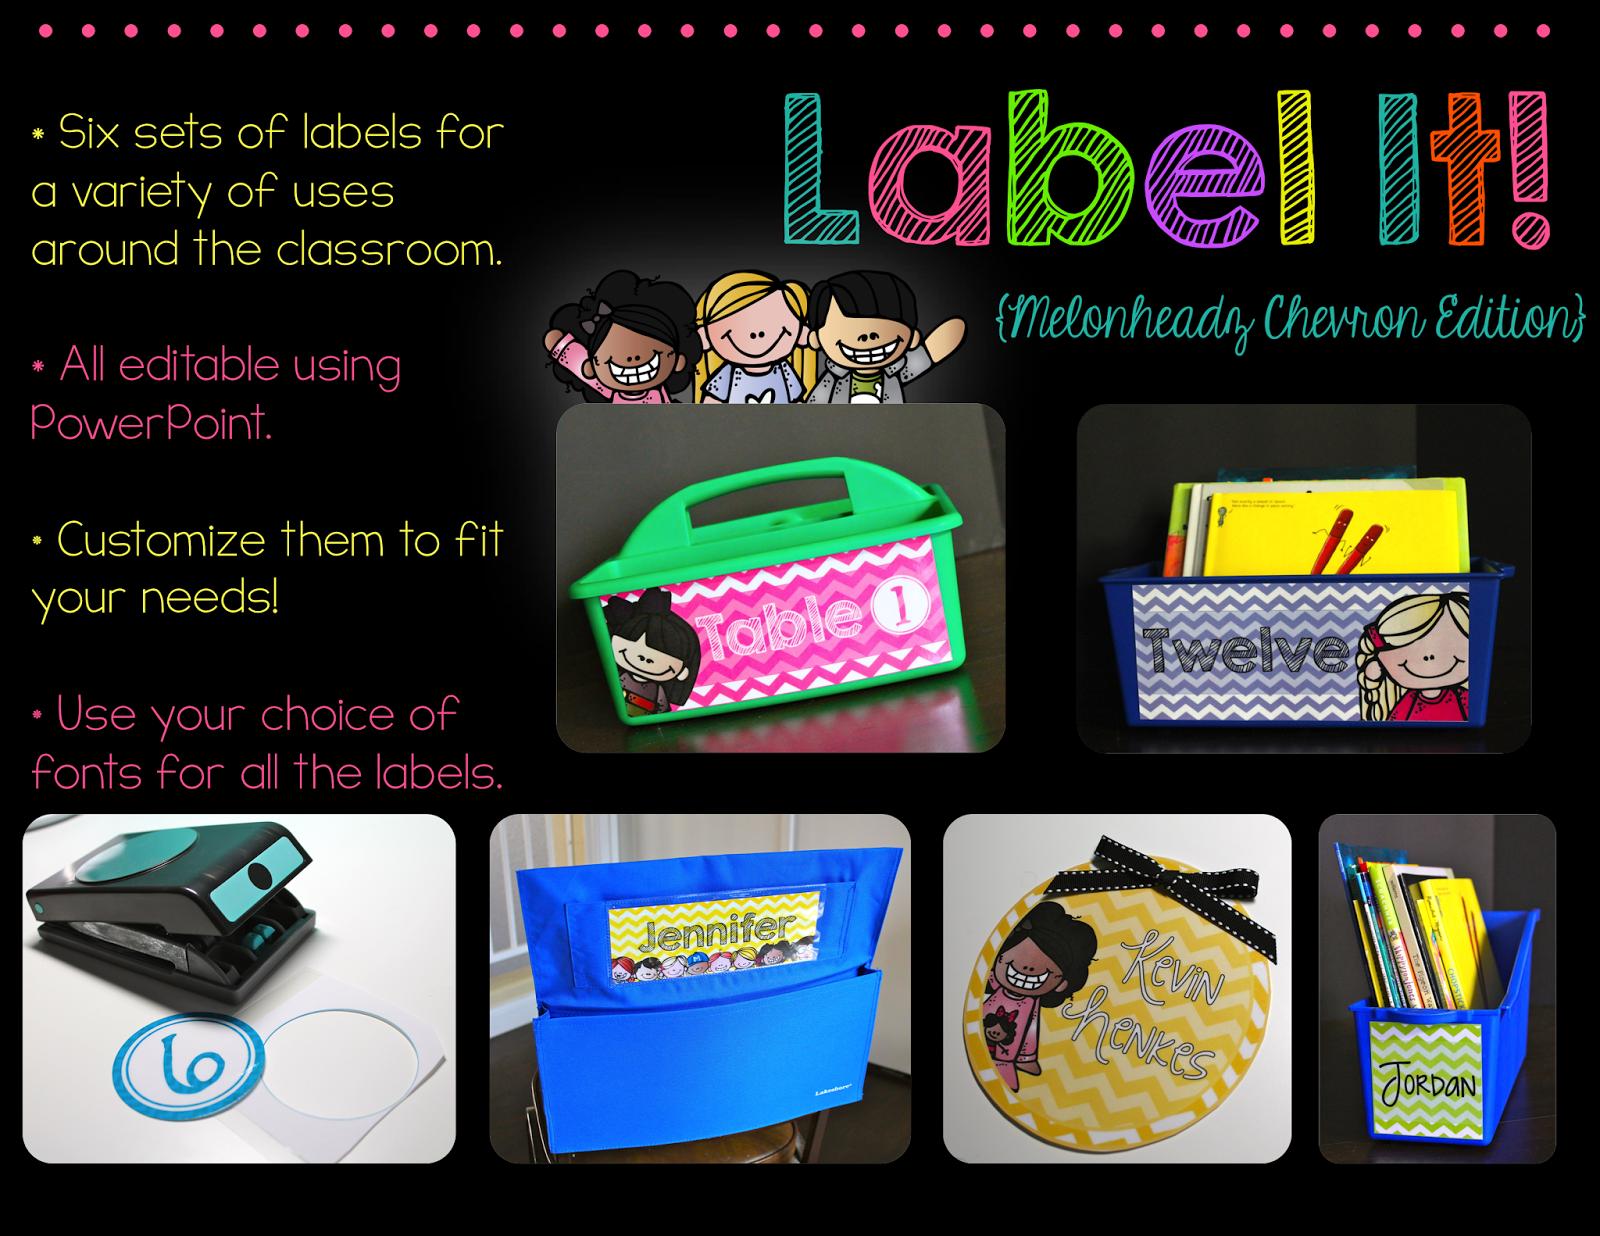 http://www.teacherspayteachers.com/Product/Label-It-Melonheadz-Chevron-Edition-Editable-Classroom-Labels-1370048